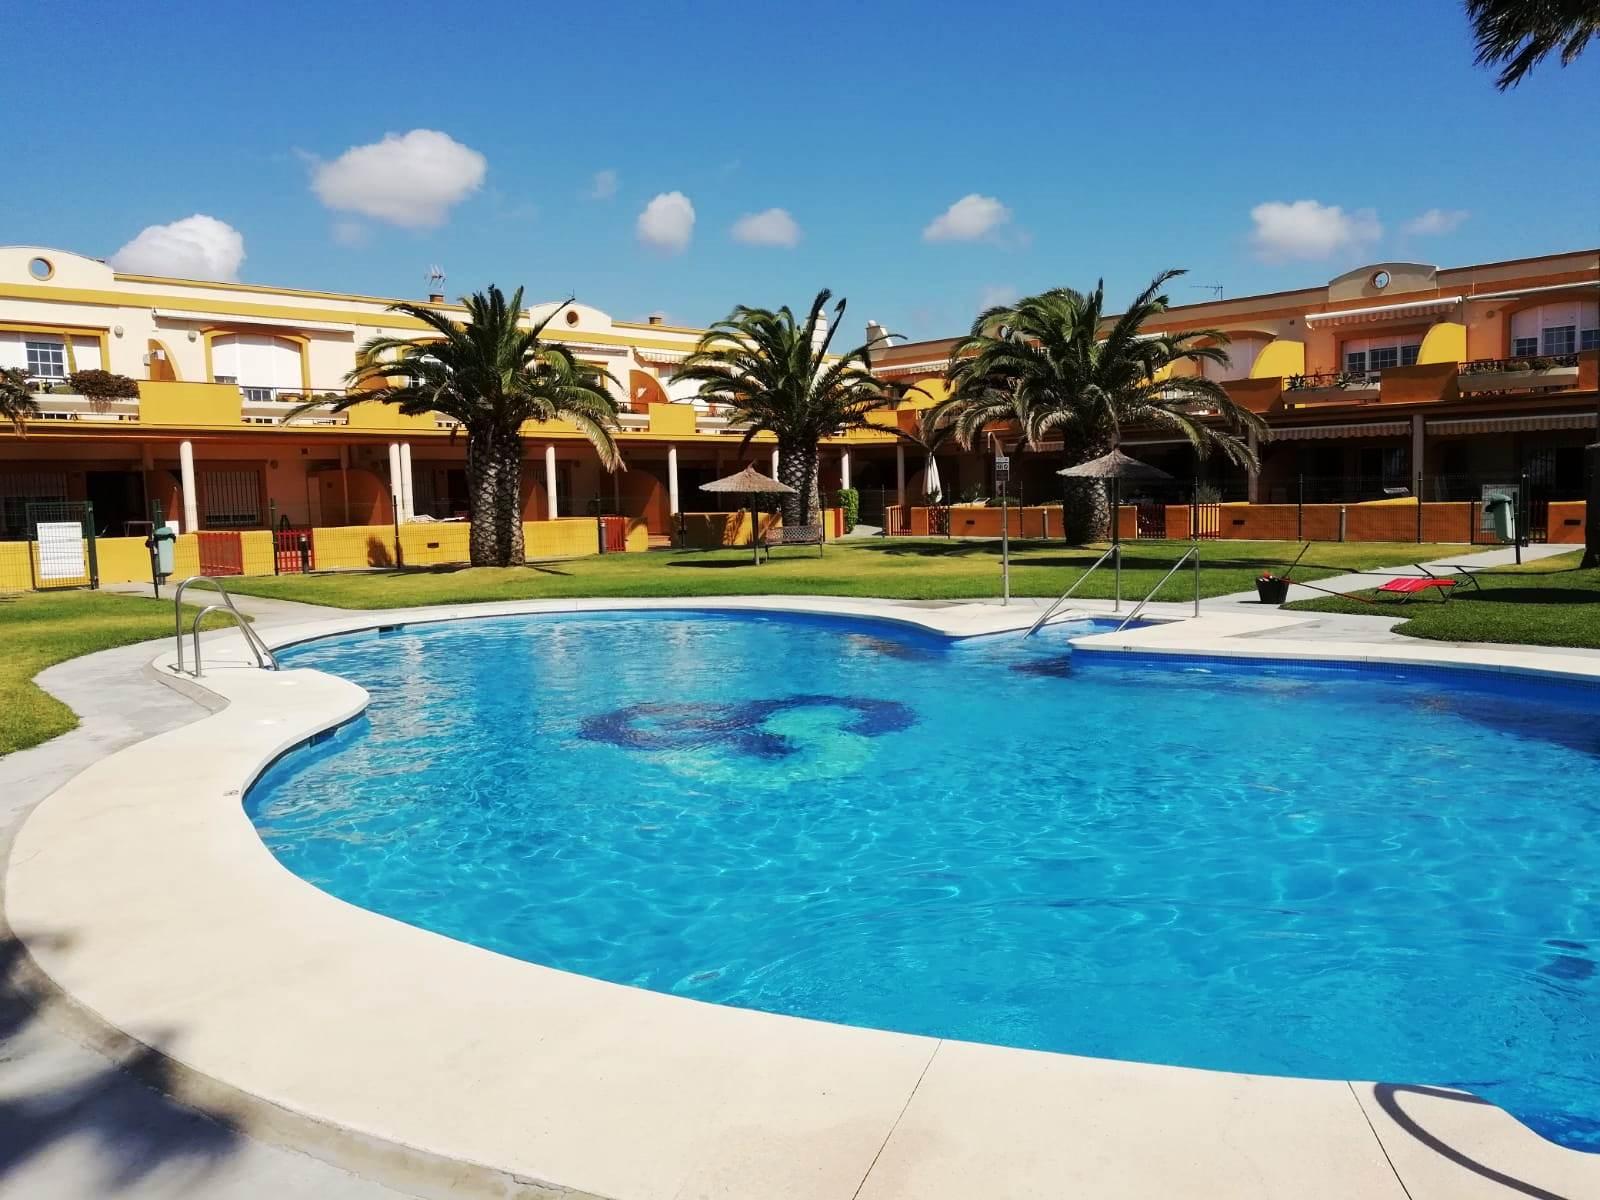 Apartamento en Venta – Tarifa – Costa de la luz – Cádiz – Andalucía